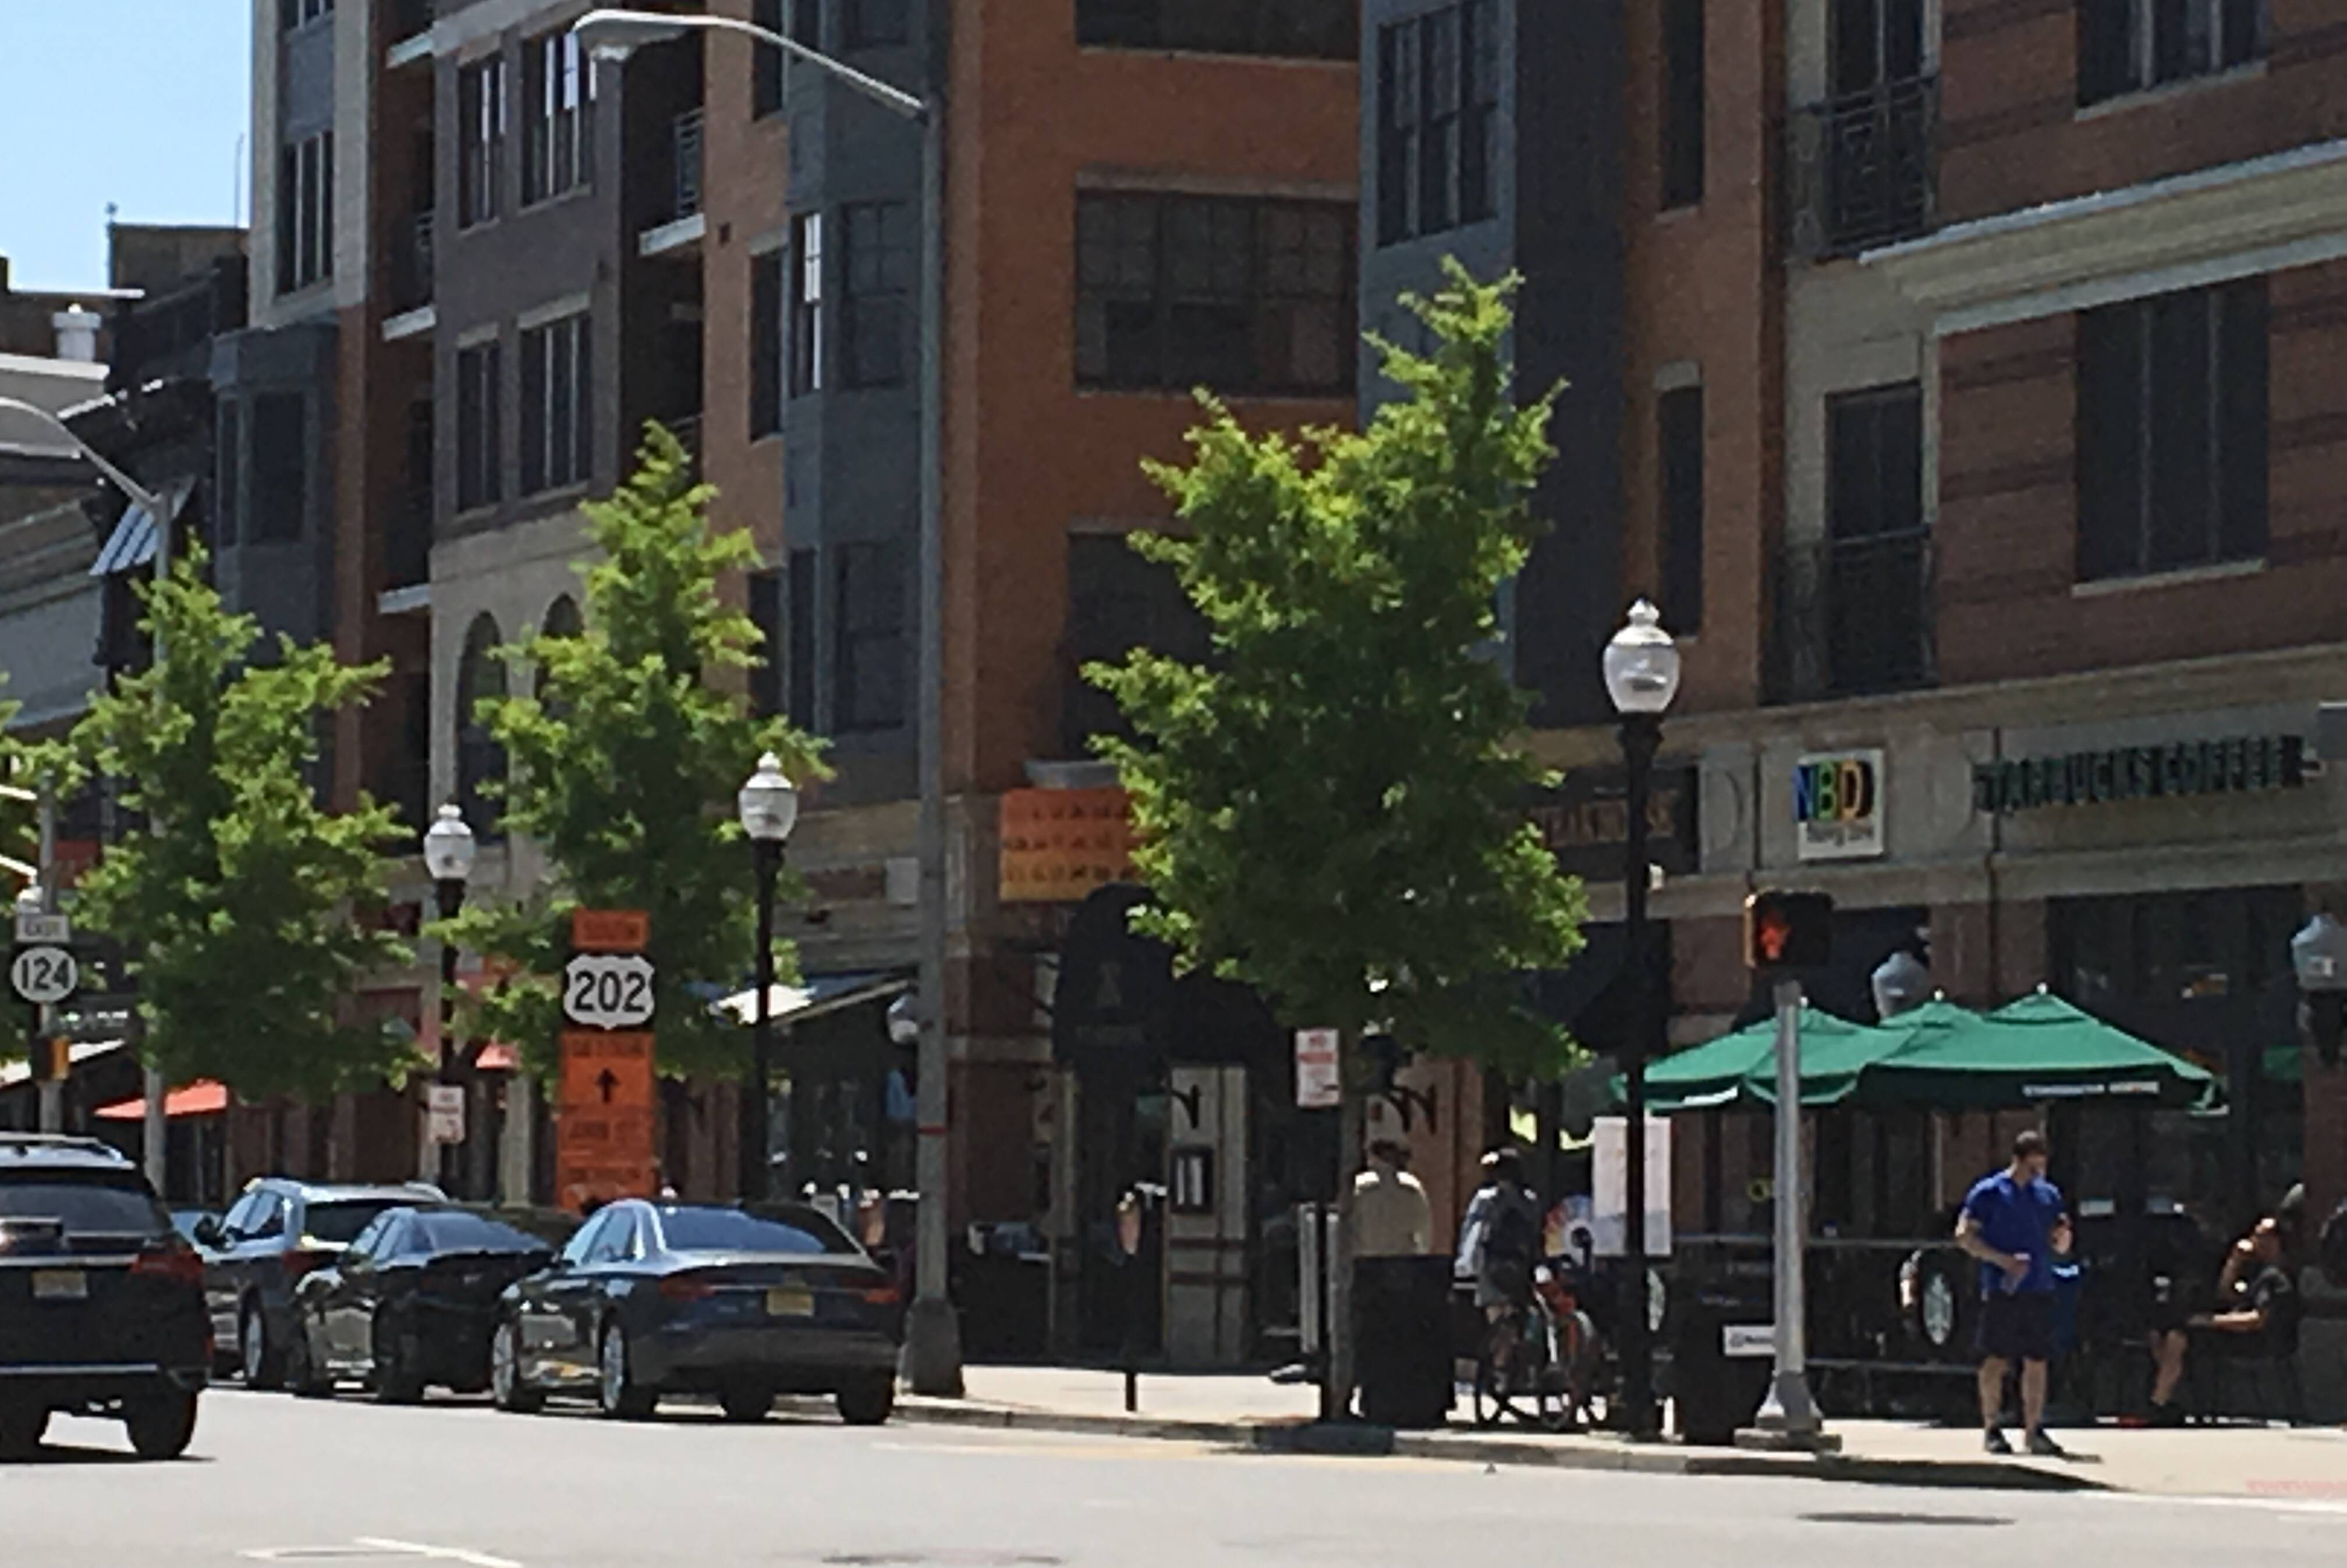 warm weather sends dining outdoors 26 morristown restaurants